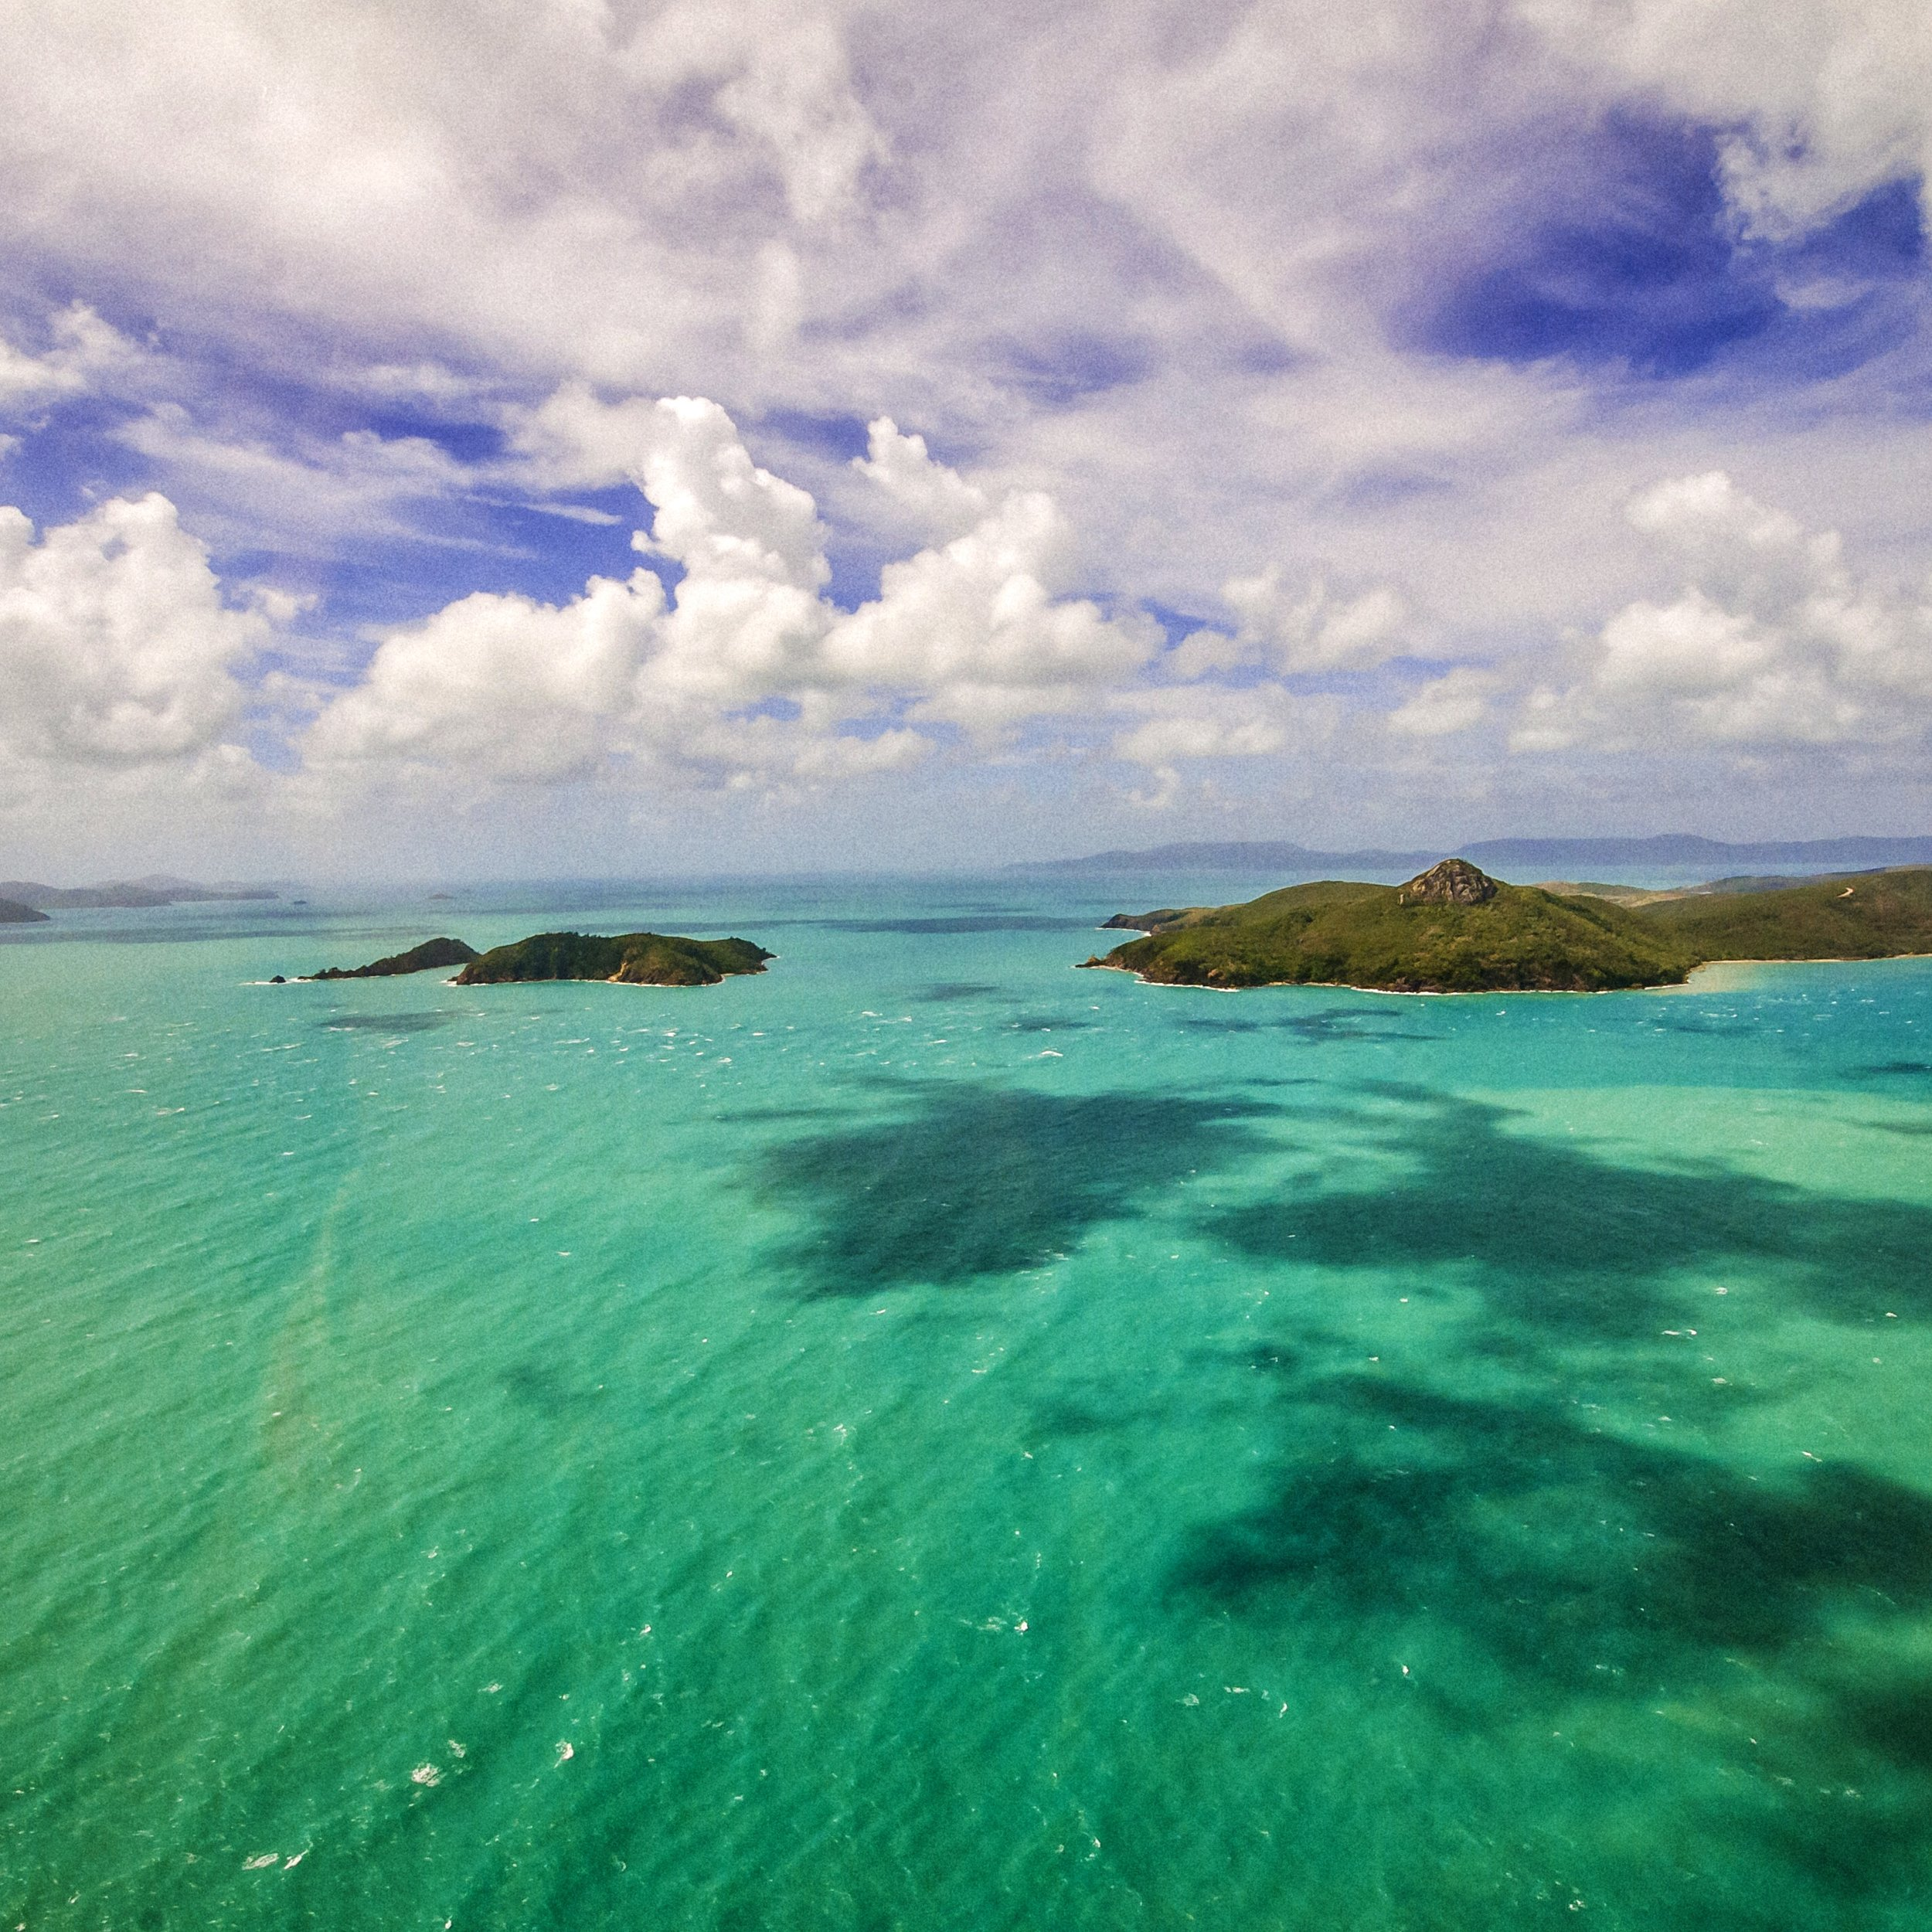 whitsundays, Australia credit: katerina katopis / coral reef image bank